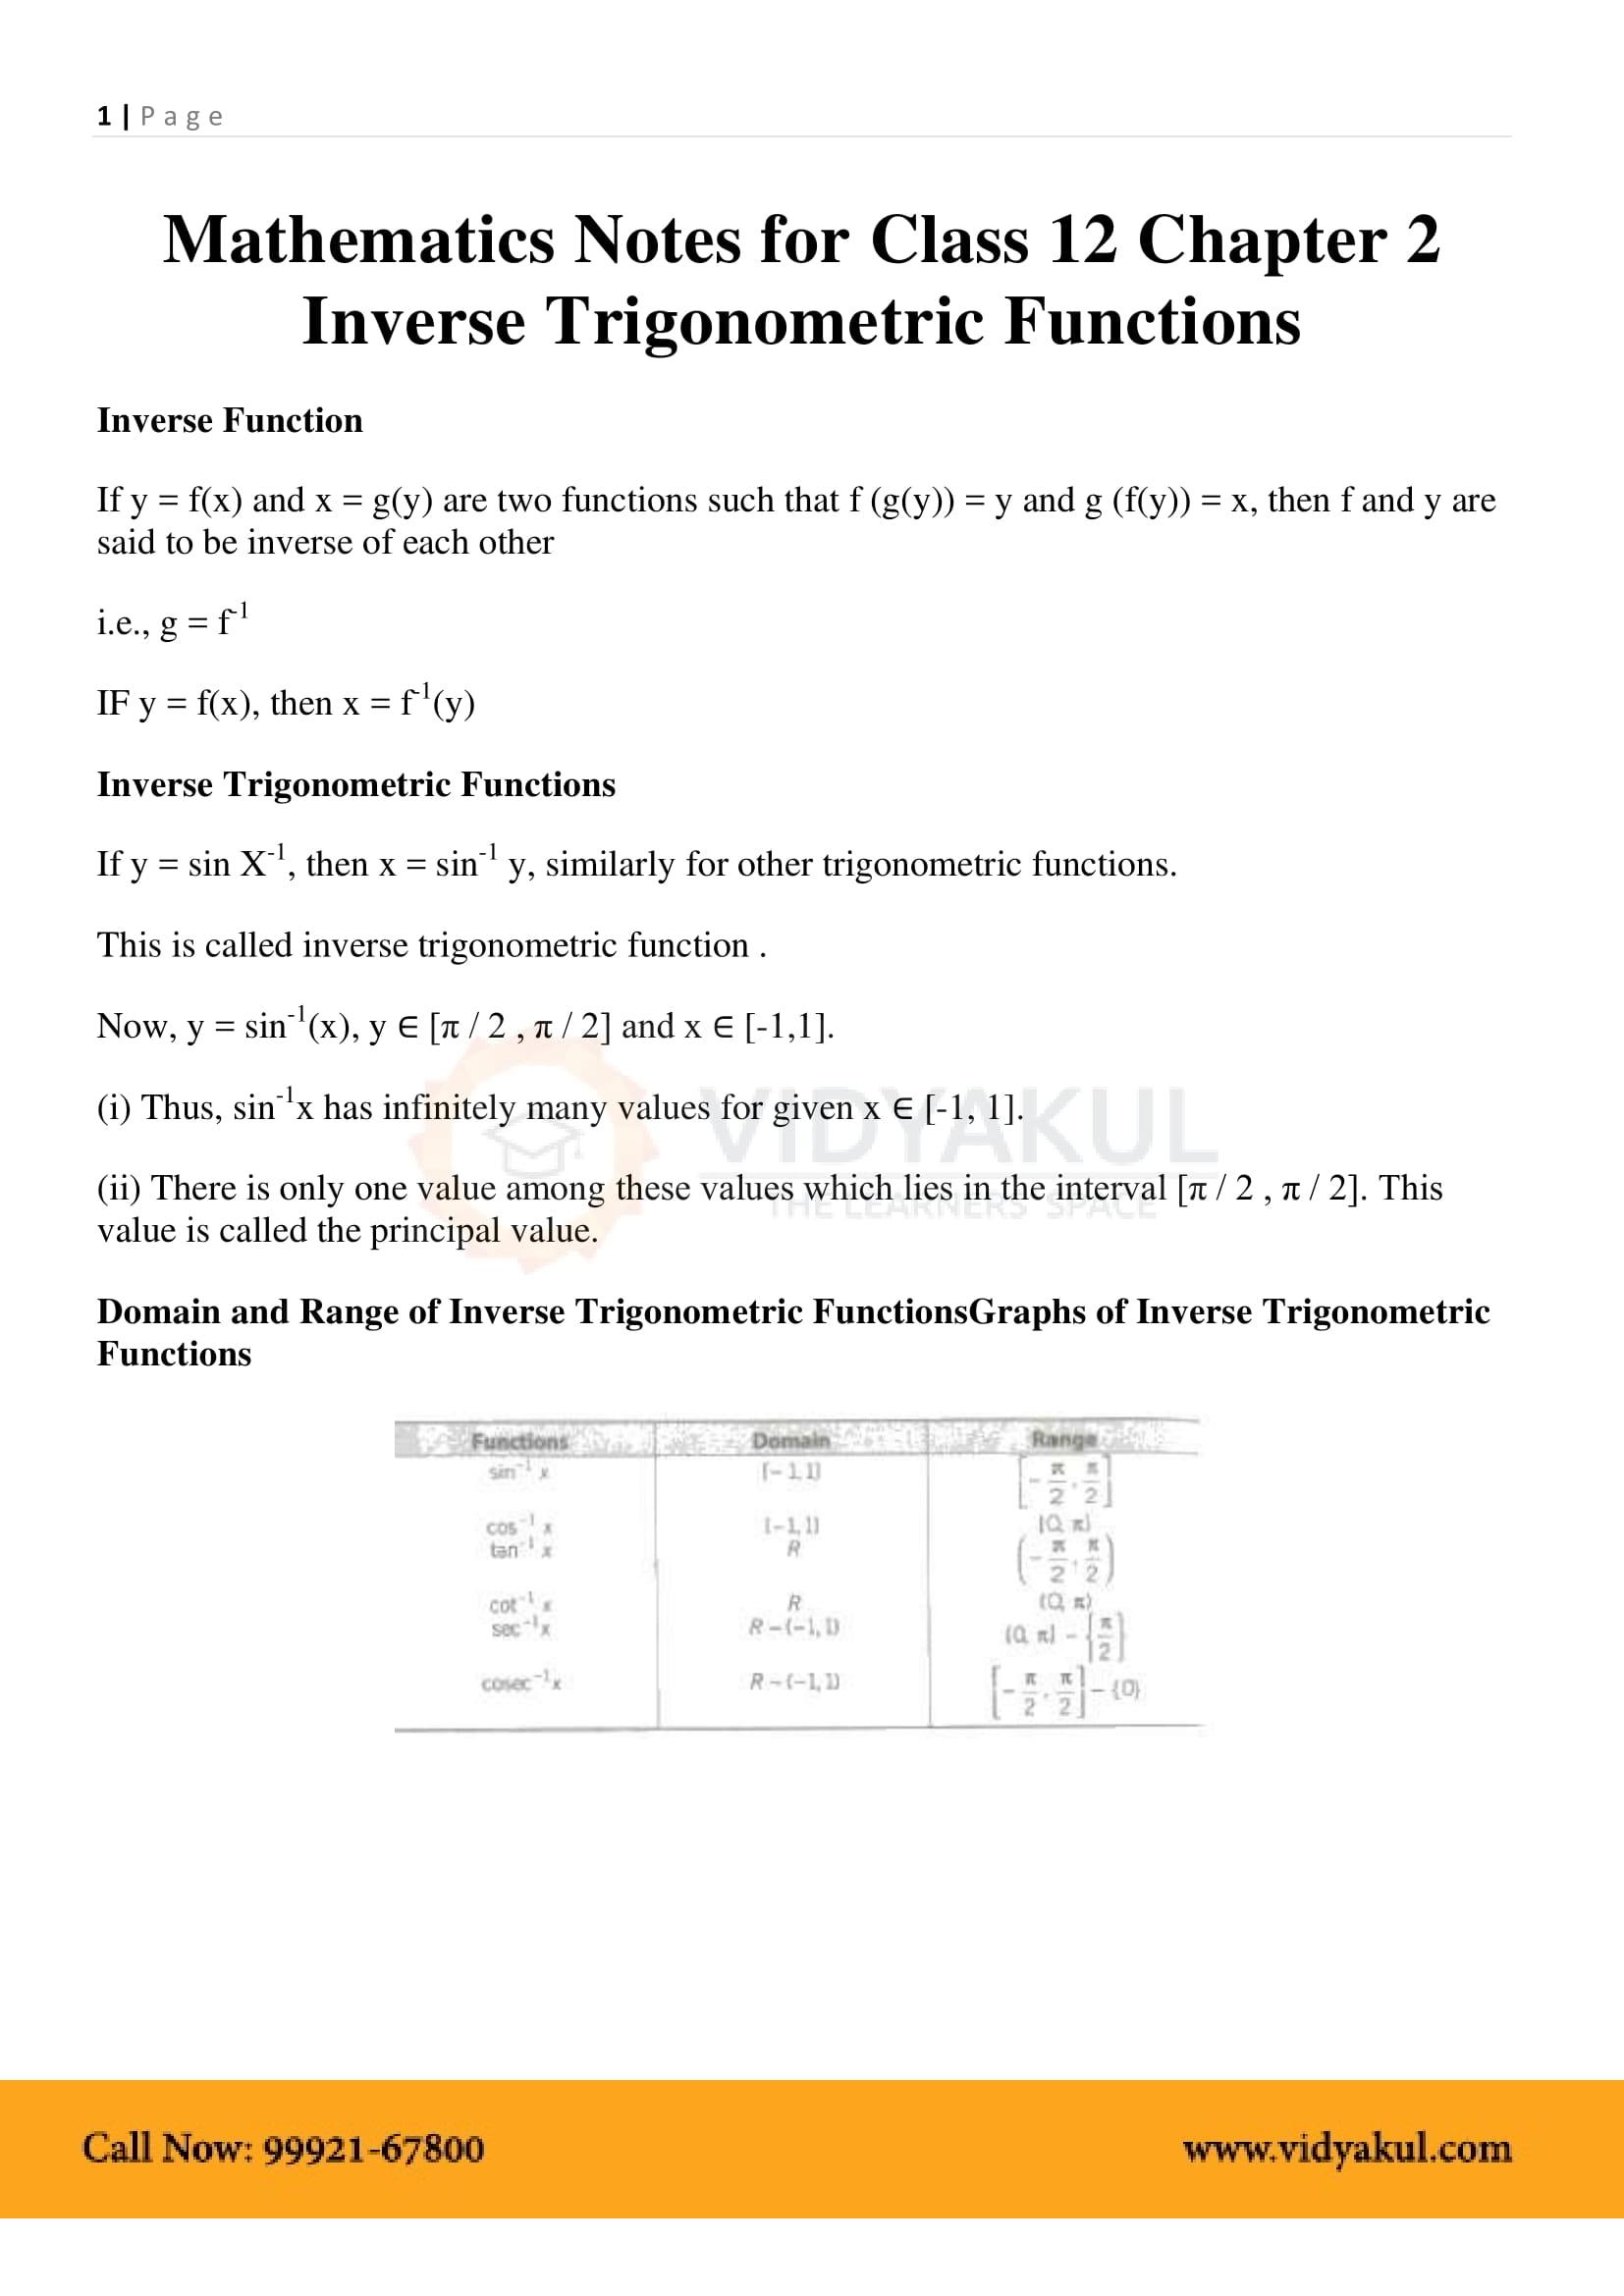 Inverse Trigonometric Functions Class 12 Formulas And